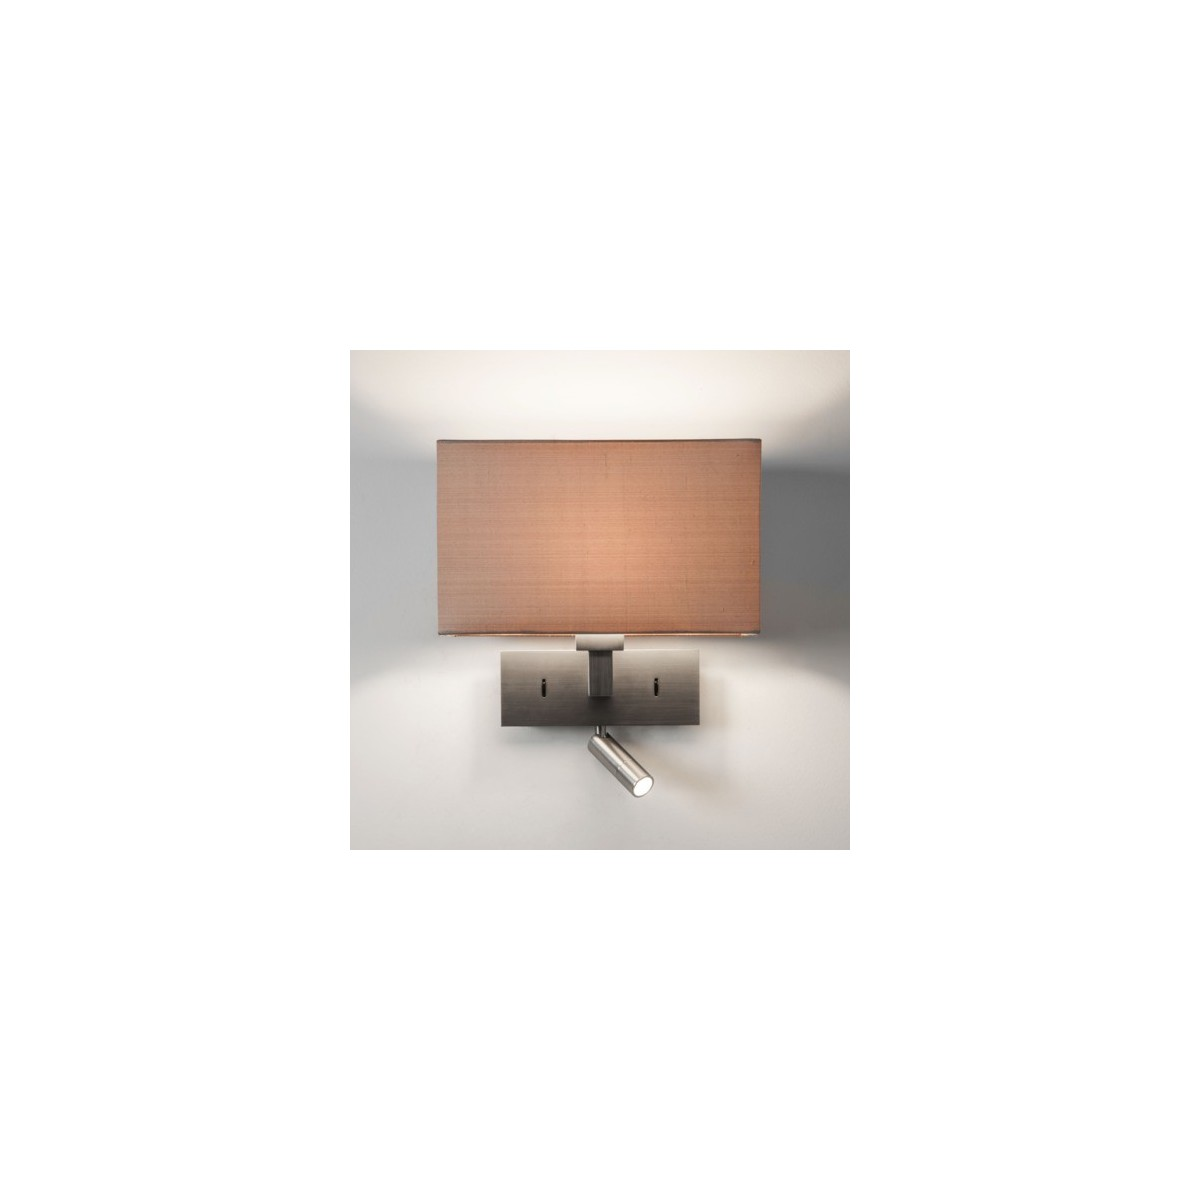 Astro Park Lane Reader LED Do Czytania 1x60W Max E27 Matowy Nikiel 1080030